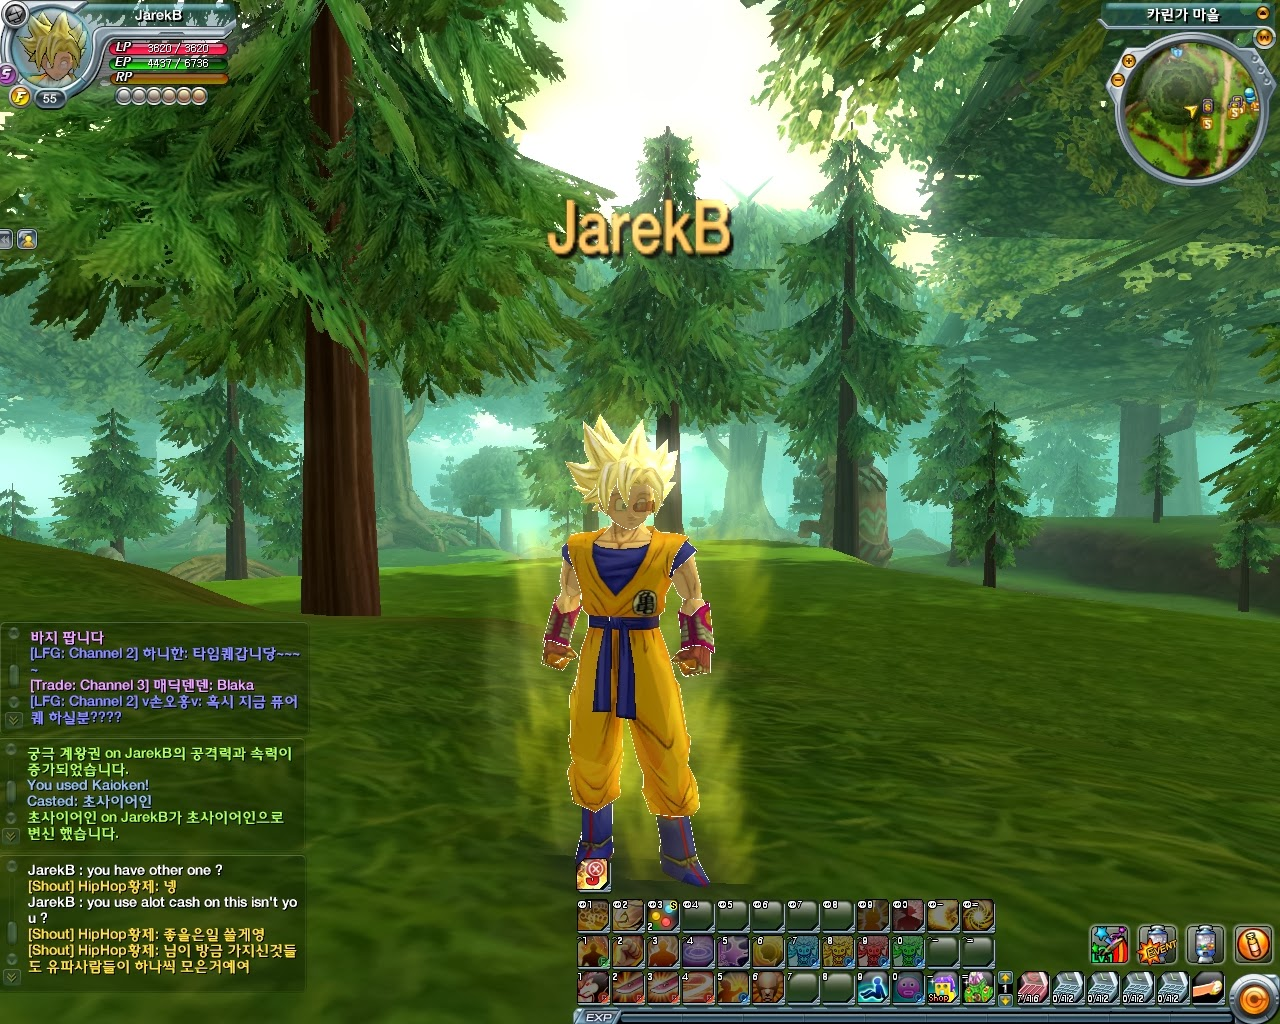 Download Dragonball Mmorpg - gettmo